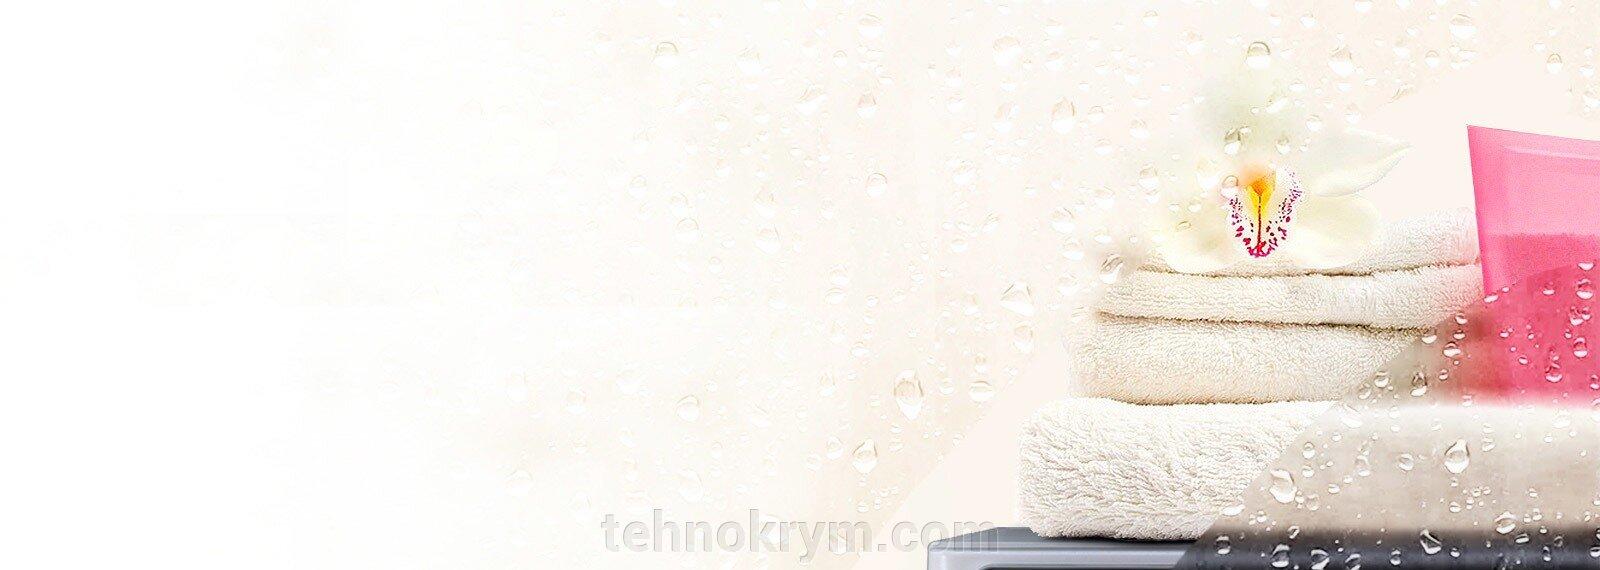 Стиральная машина Стиральная машина LG F2M5HS4W с прямым приводом и функцией пара Steam - фото LG F2M5HS4W